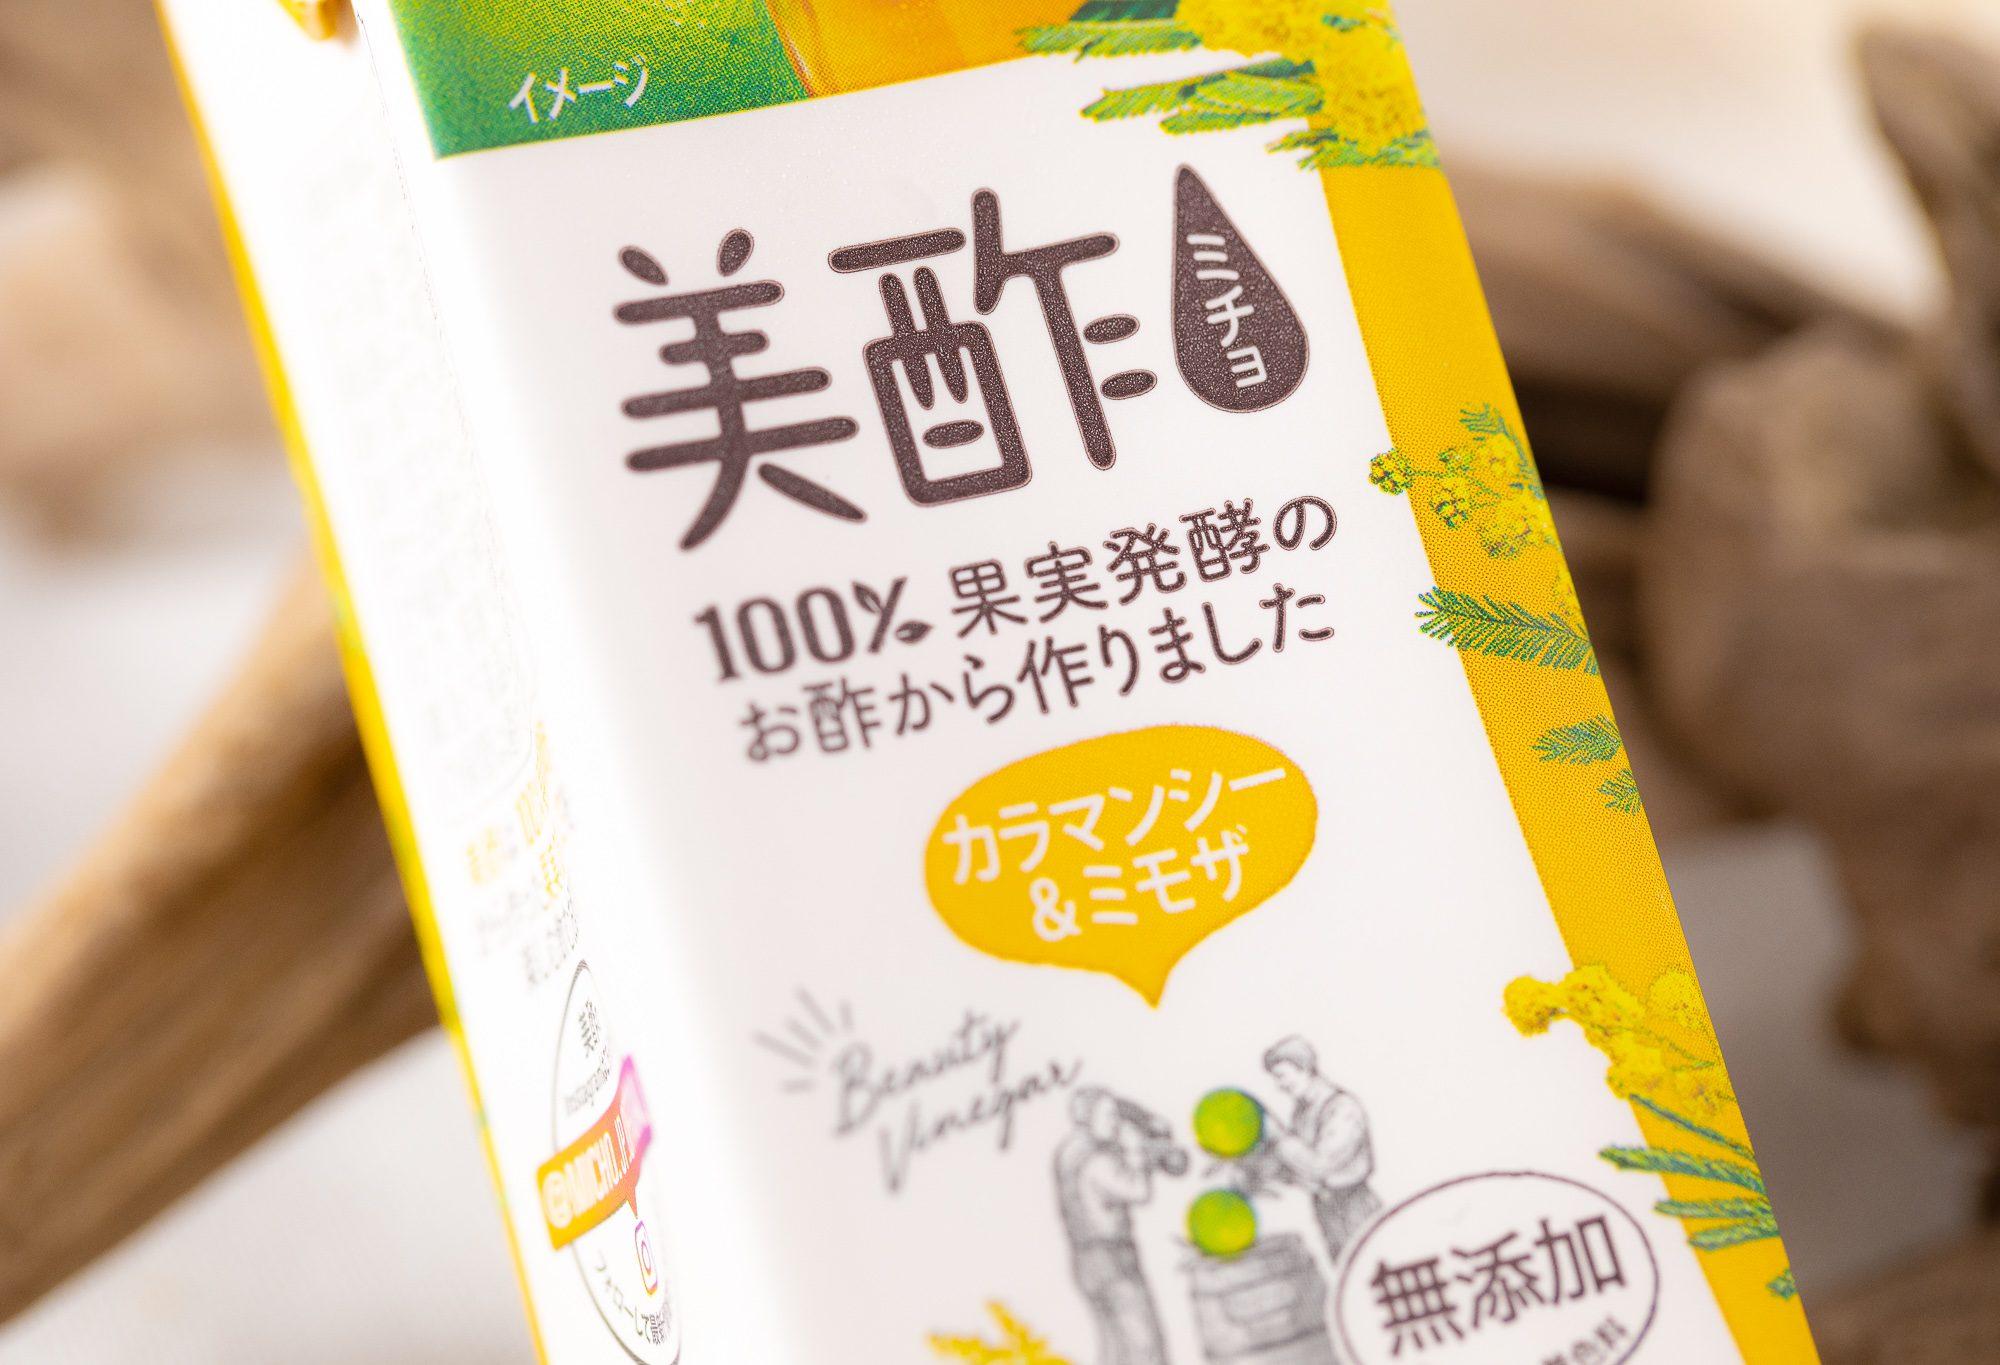 CJ FOODS JAPAN『美酢 カラマンシー&ミモザ 200ml』は柑橘類のほのかな酸味と苦味にミモザの芳醇な香りが鼻をくすぐる爽やかお酢ドリンク!